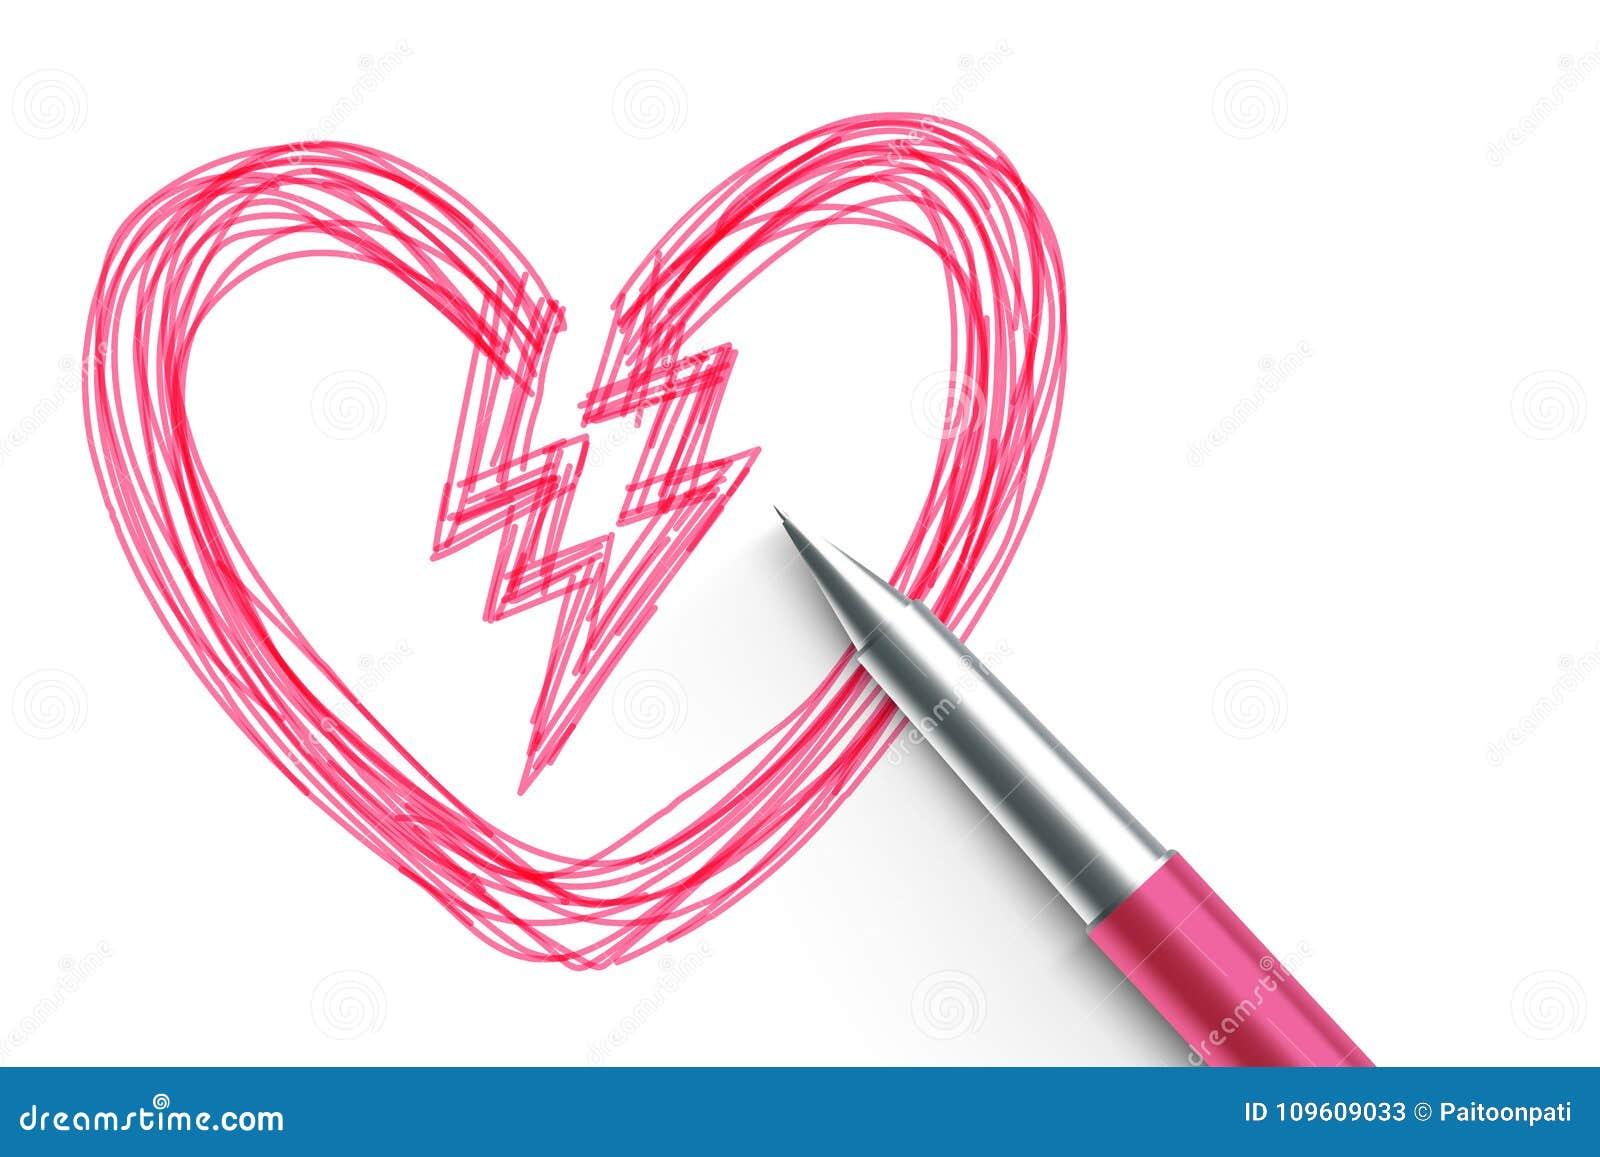 Broken Heart Symbol Hand Drawing By Pen Sketch Pink Color Valentine